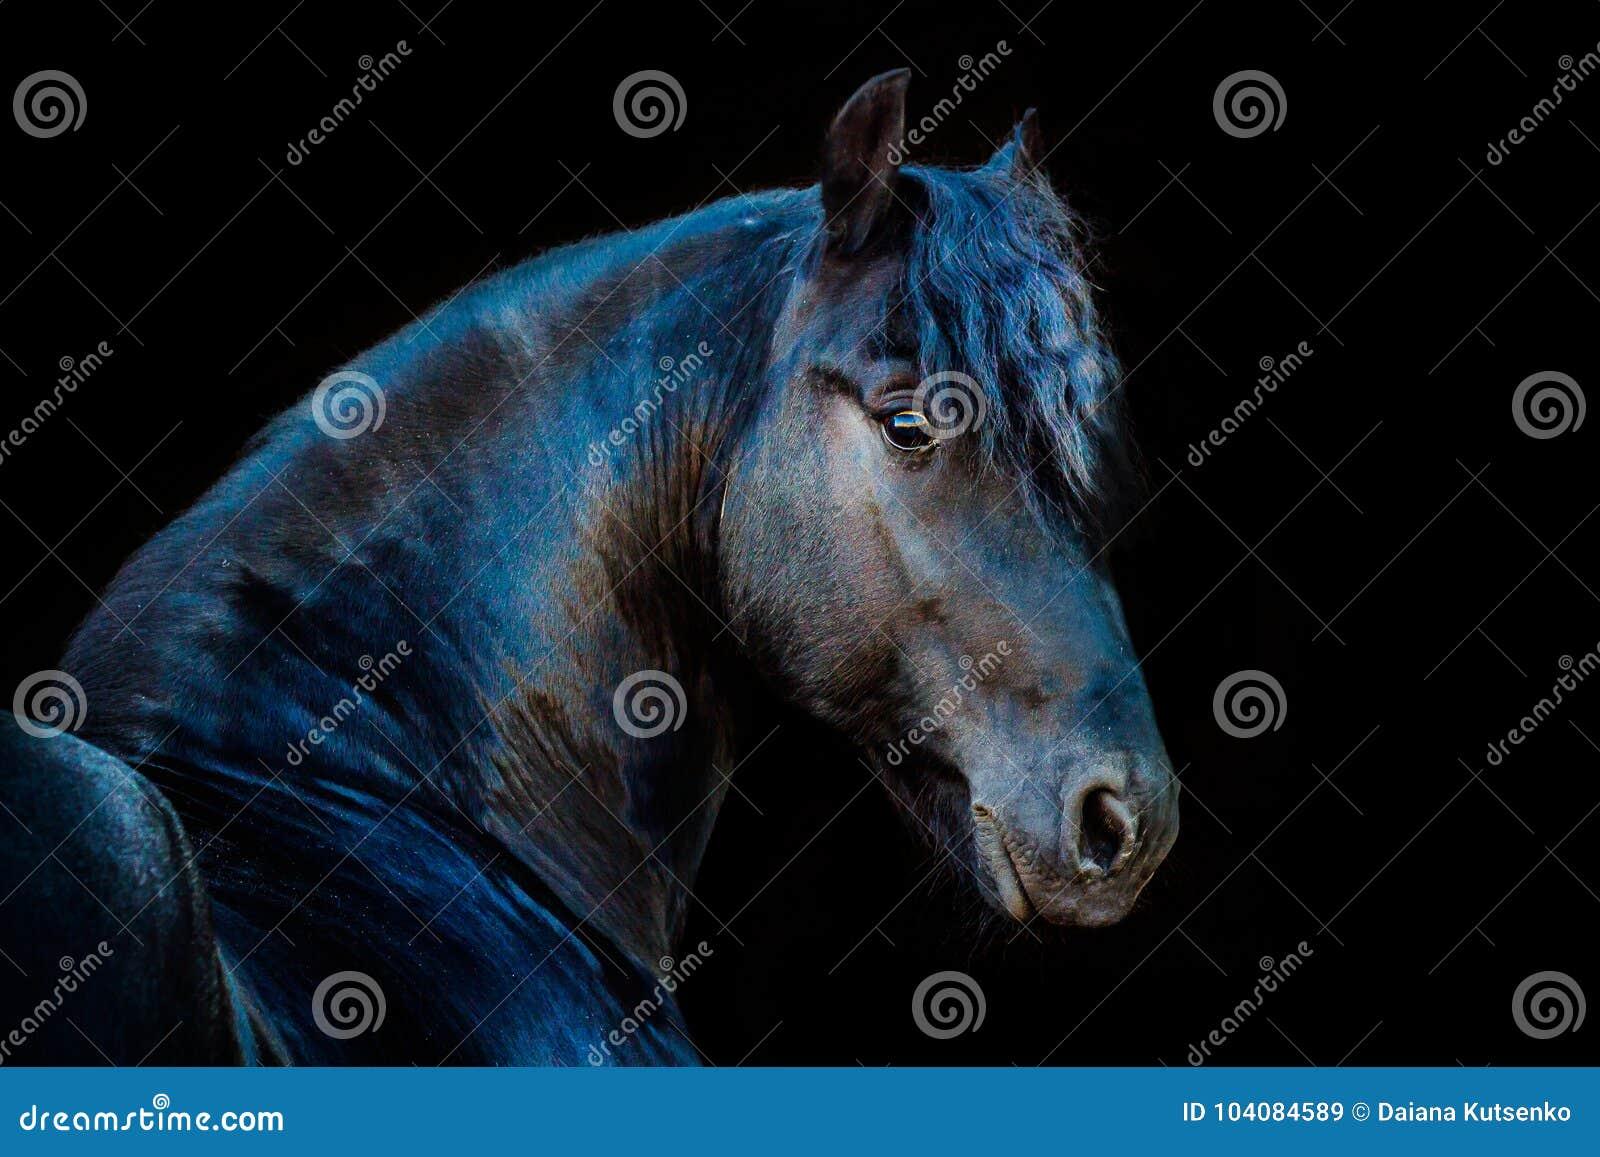 Portraits Of Horses Stock Image Image Of Domestic Background 104084589